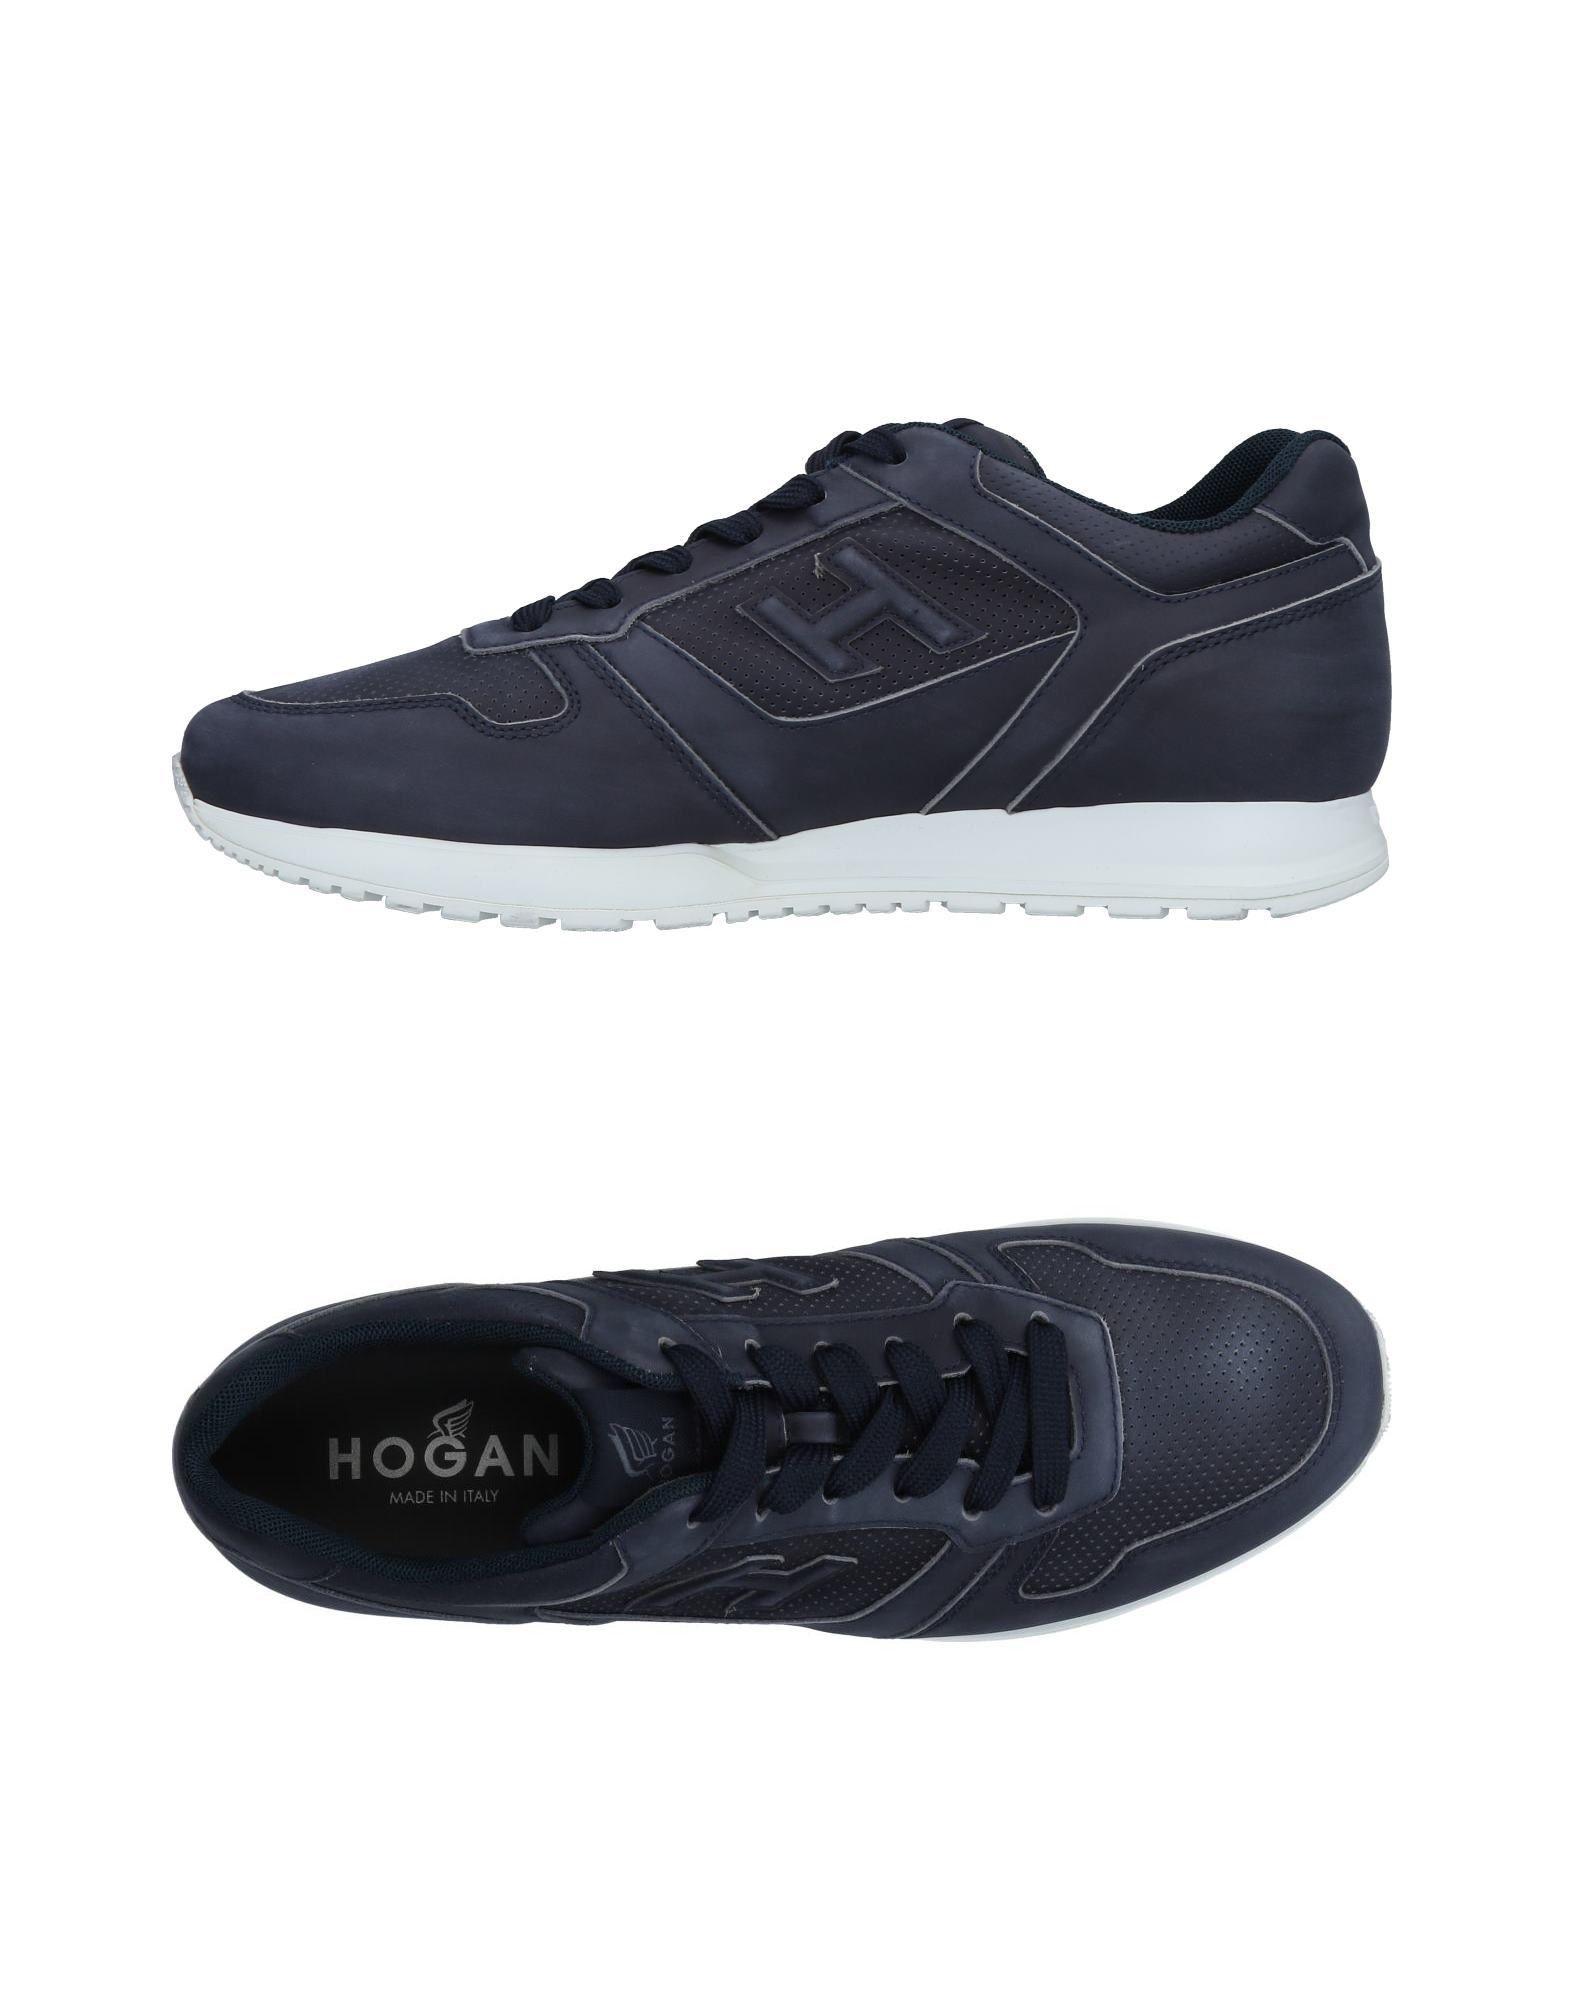 Hogan Sneakers Herren  11402566NR Gute Qualität beliebte Schuhe